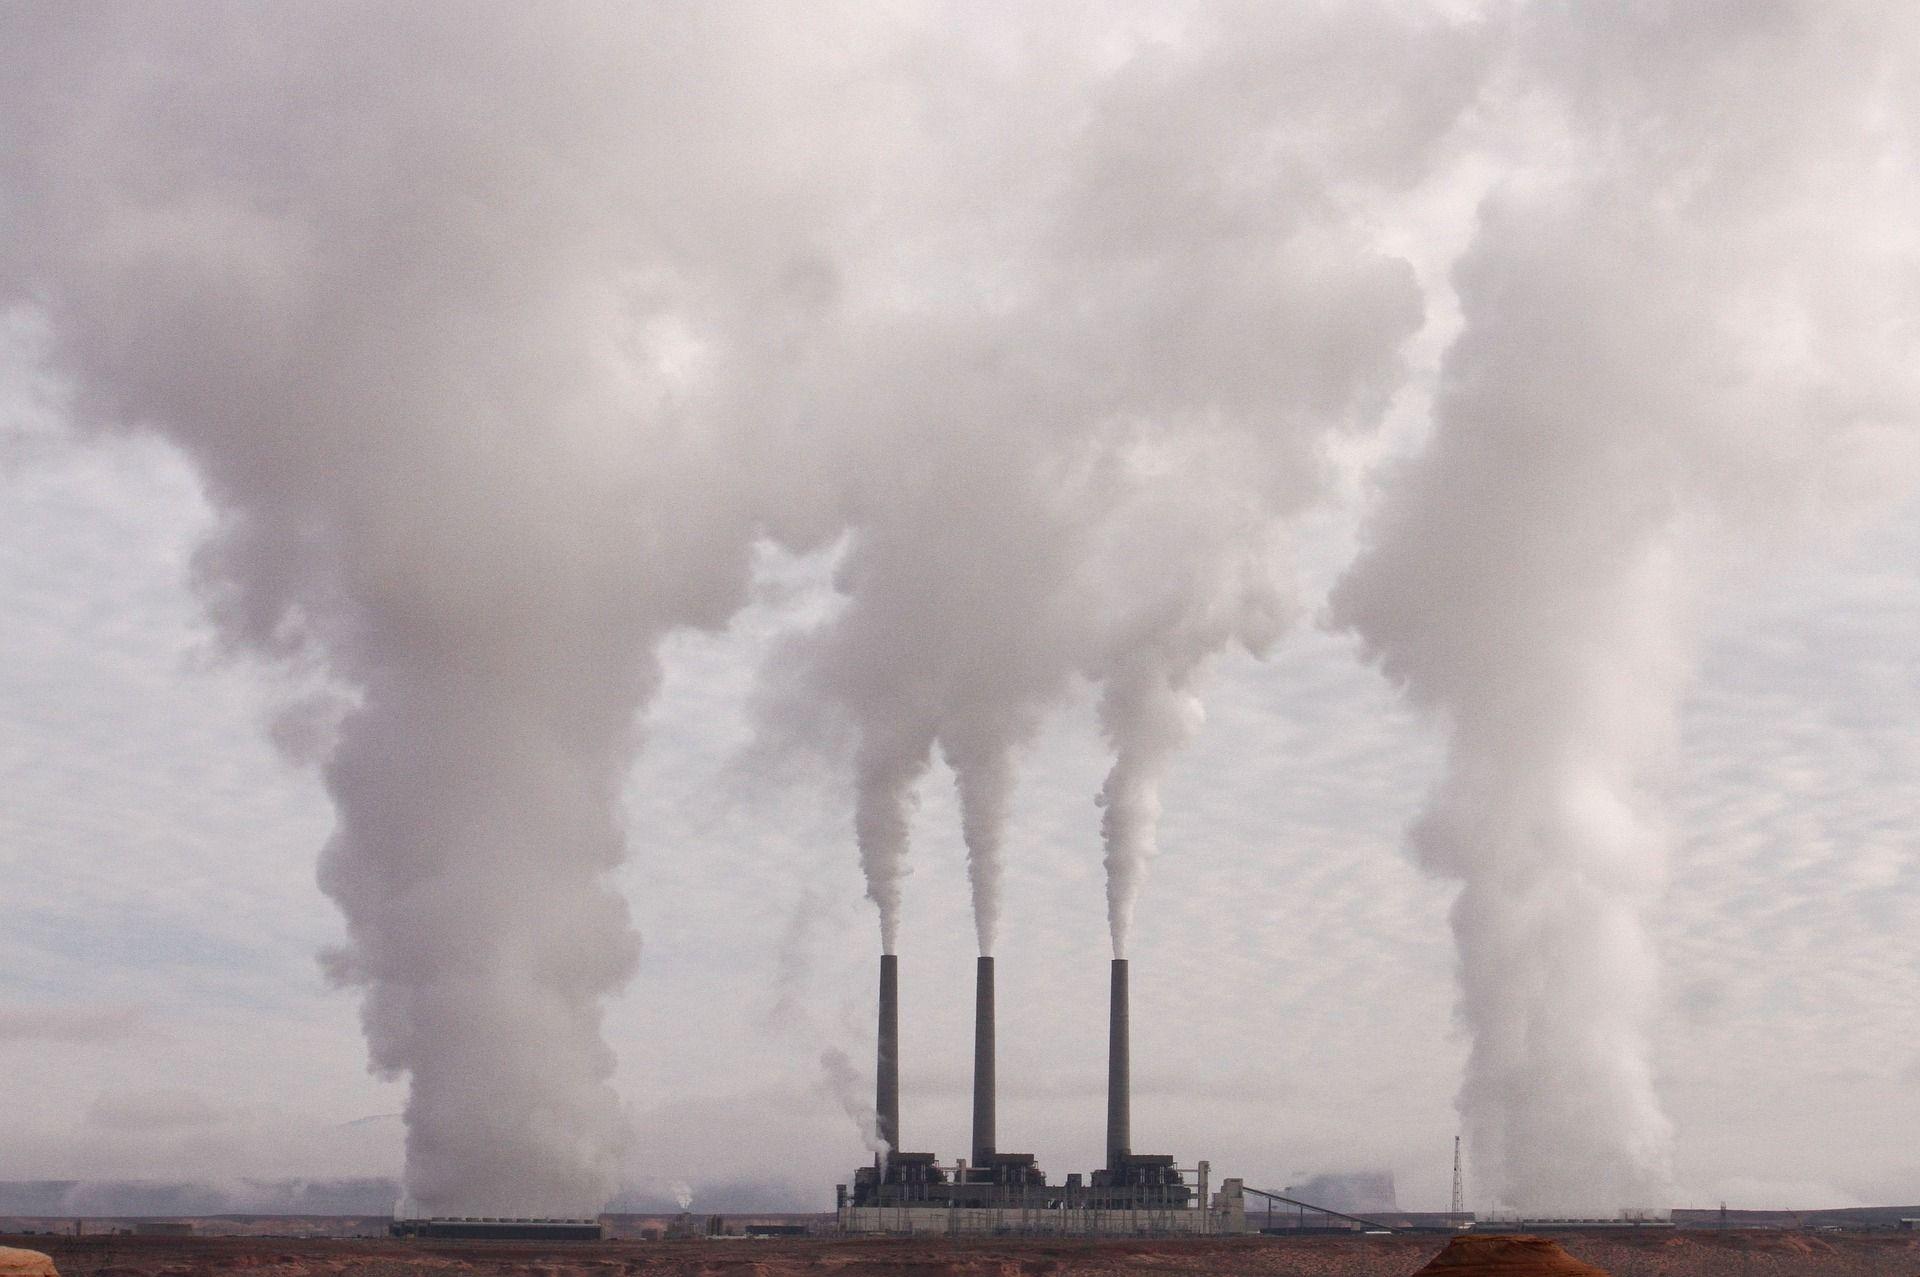 Masalah Umum Lingkungan Hidup Yang Dihadapi Oleh Badan Pelestarian Alam Irlandia Utara